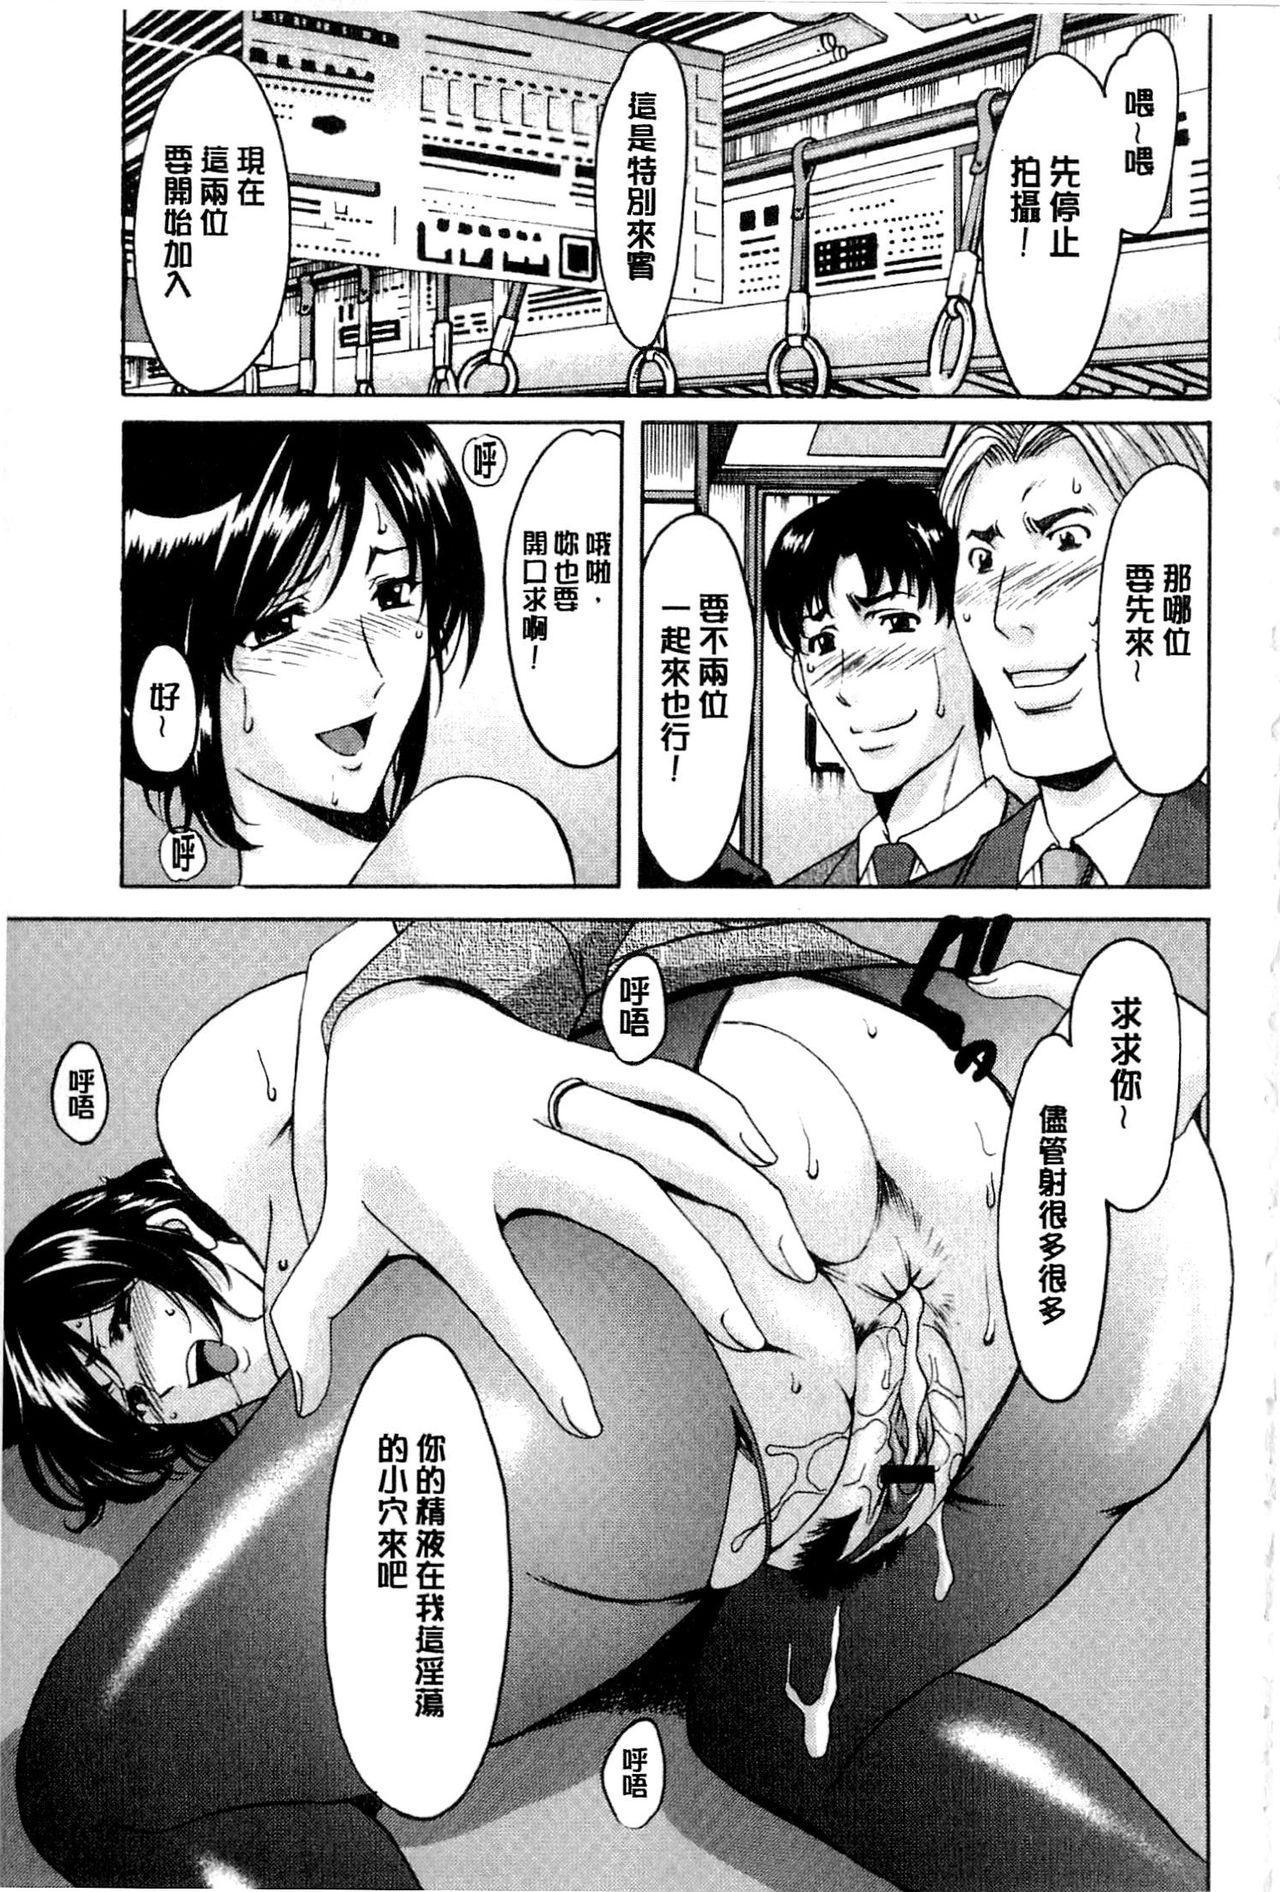 Sennyu Tsuma Satomi Kiroku   臥底人妻里美 洗腦凌辱的記錄 下集 31